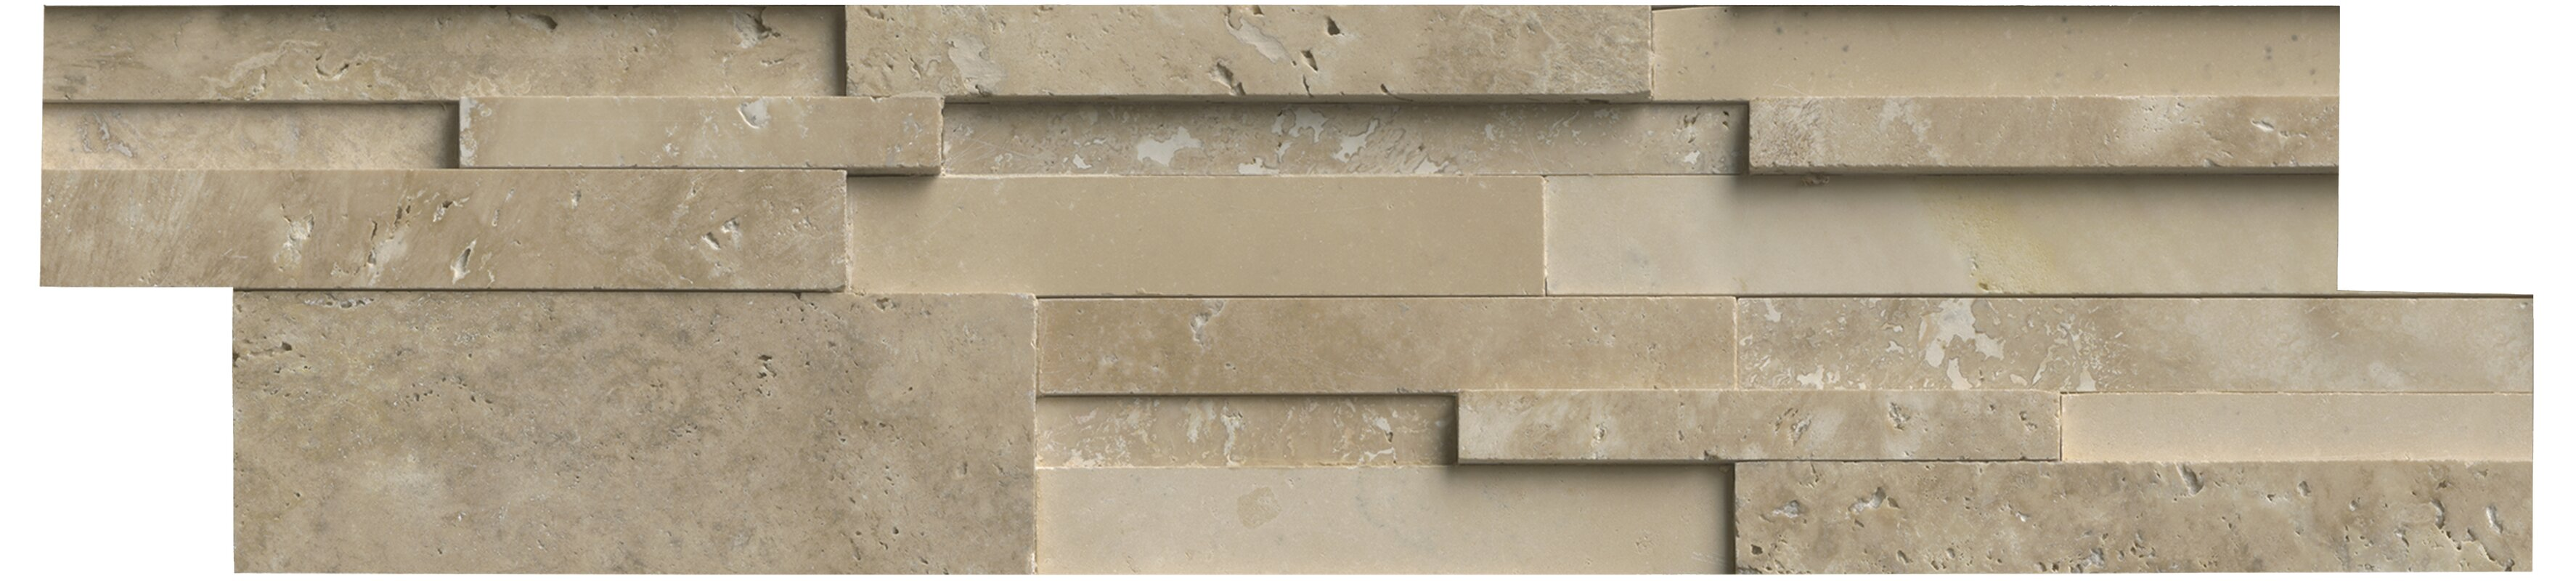 Msi 6 x 24 travertine splitface tile in durango cream reviews 6 x 24 travertine splitface tile in durango cream doublecrazyfo Images